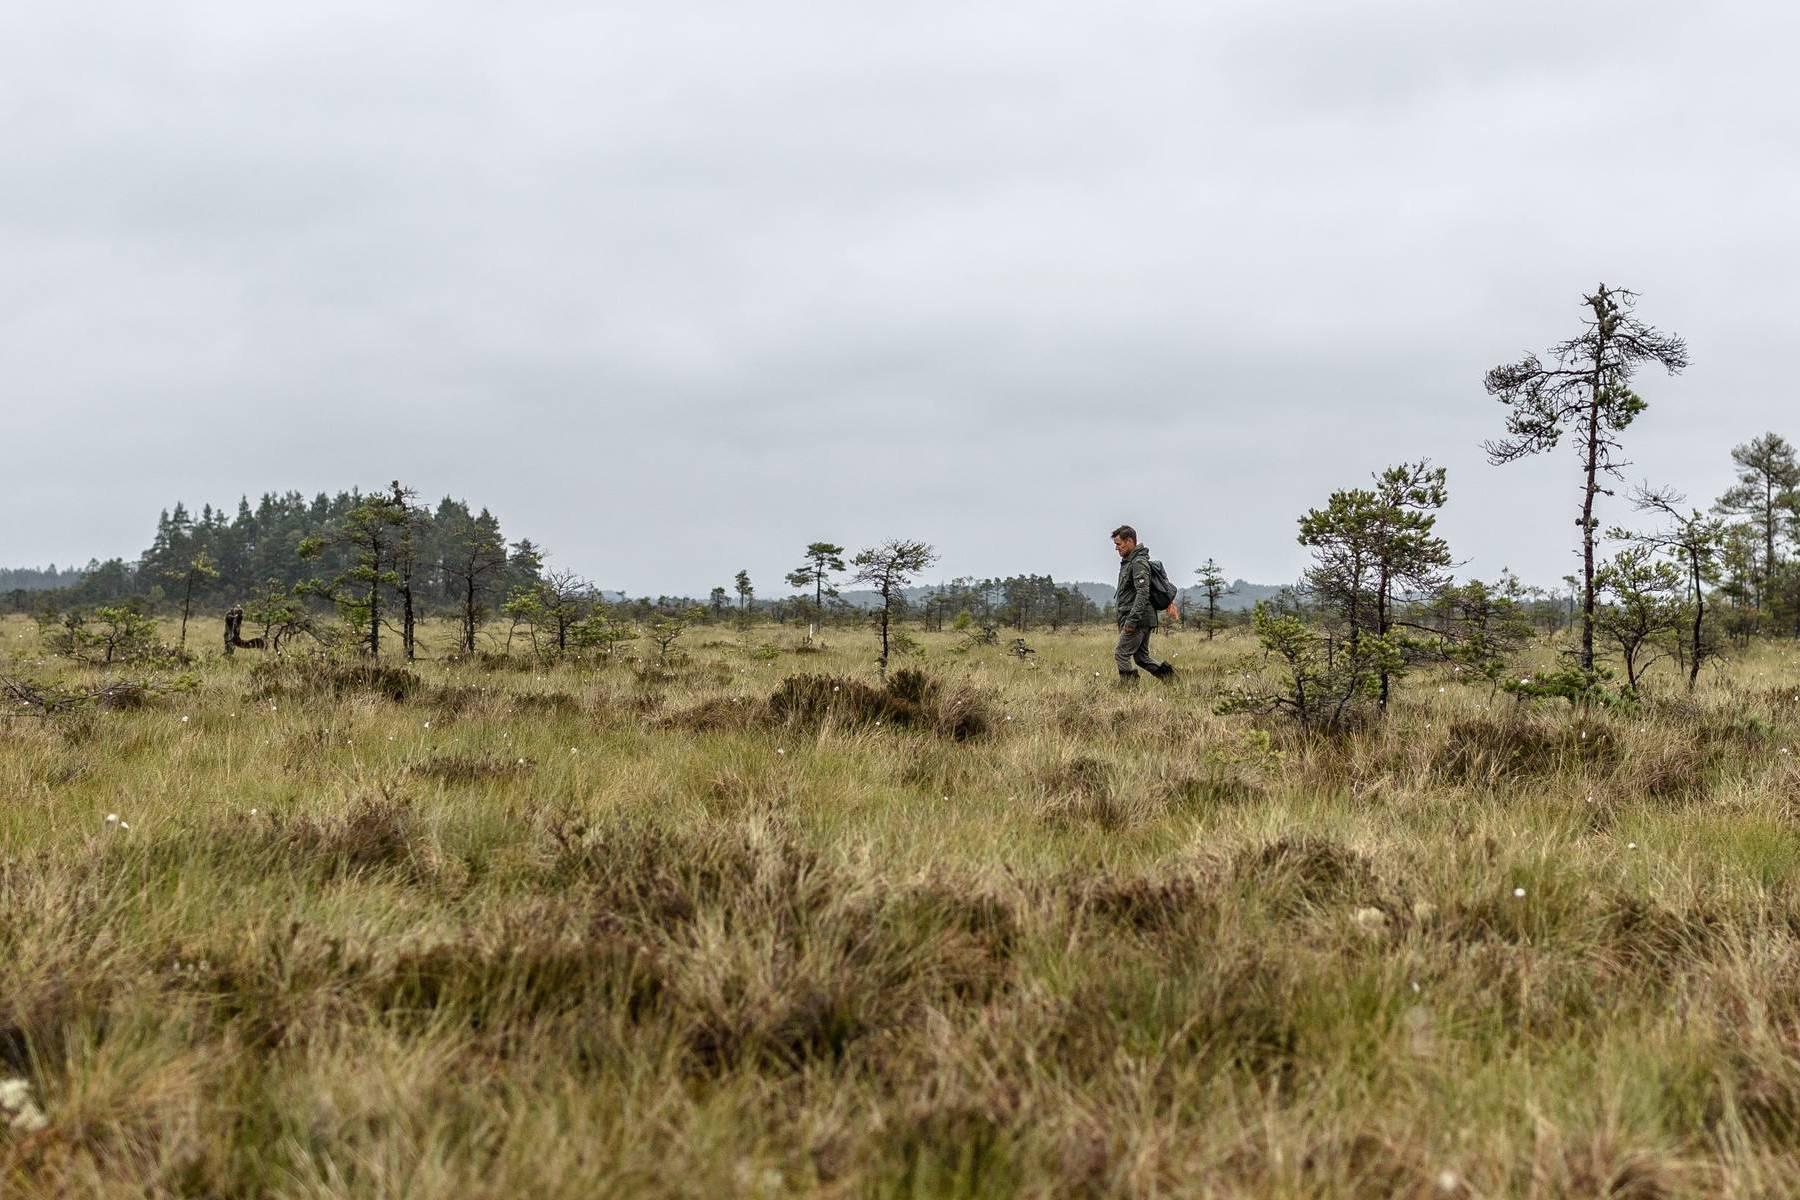 Store Mosse nationalpark och en man som går ute på mossen